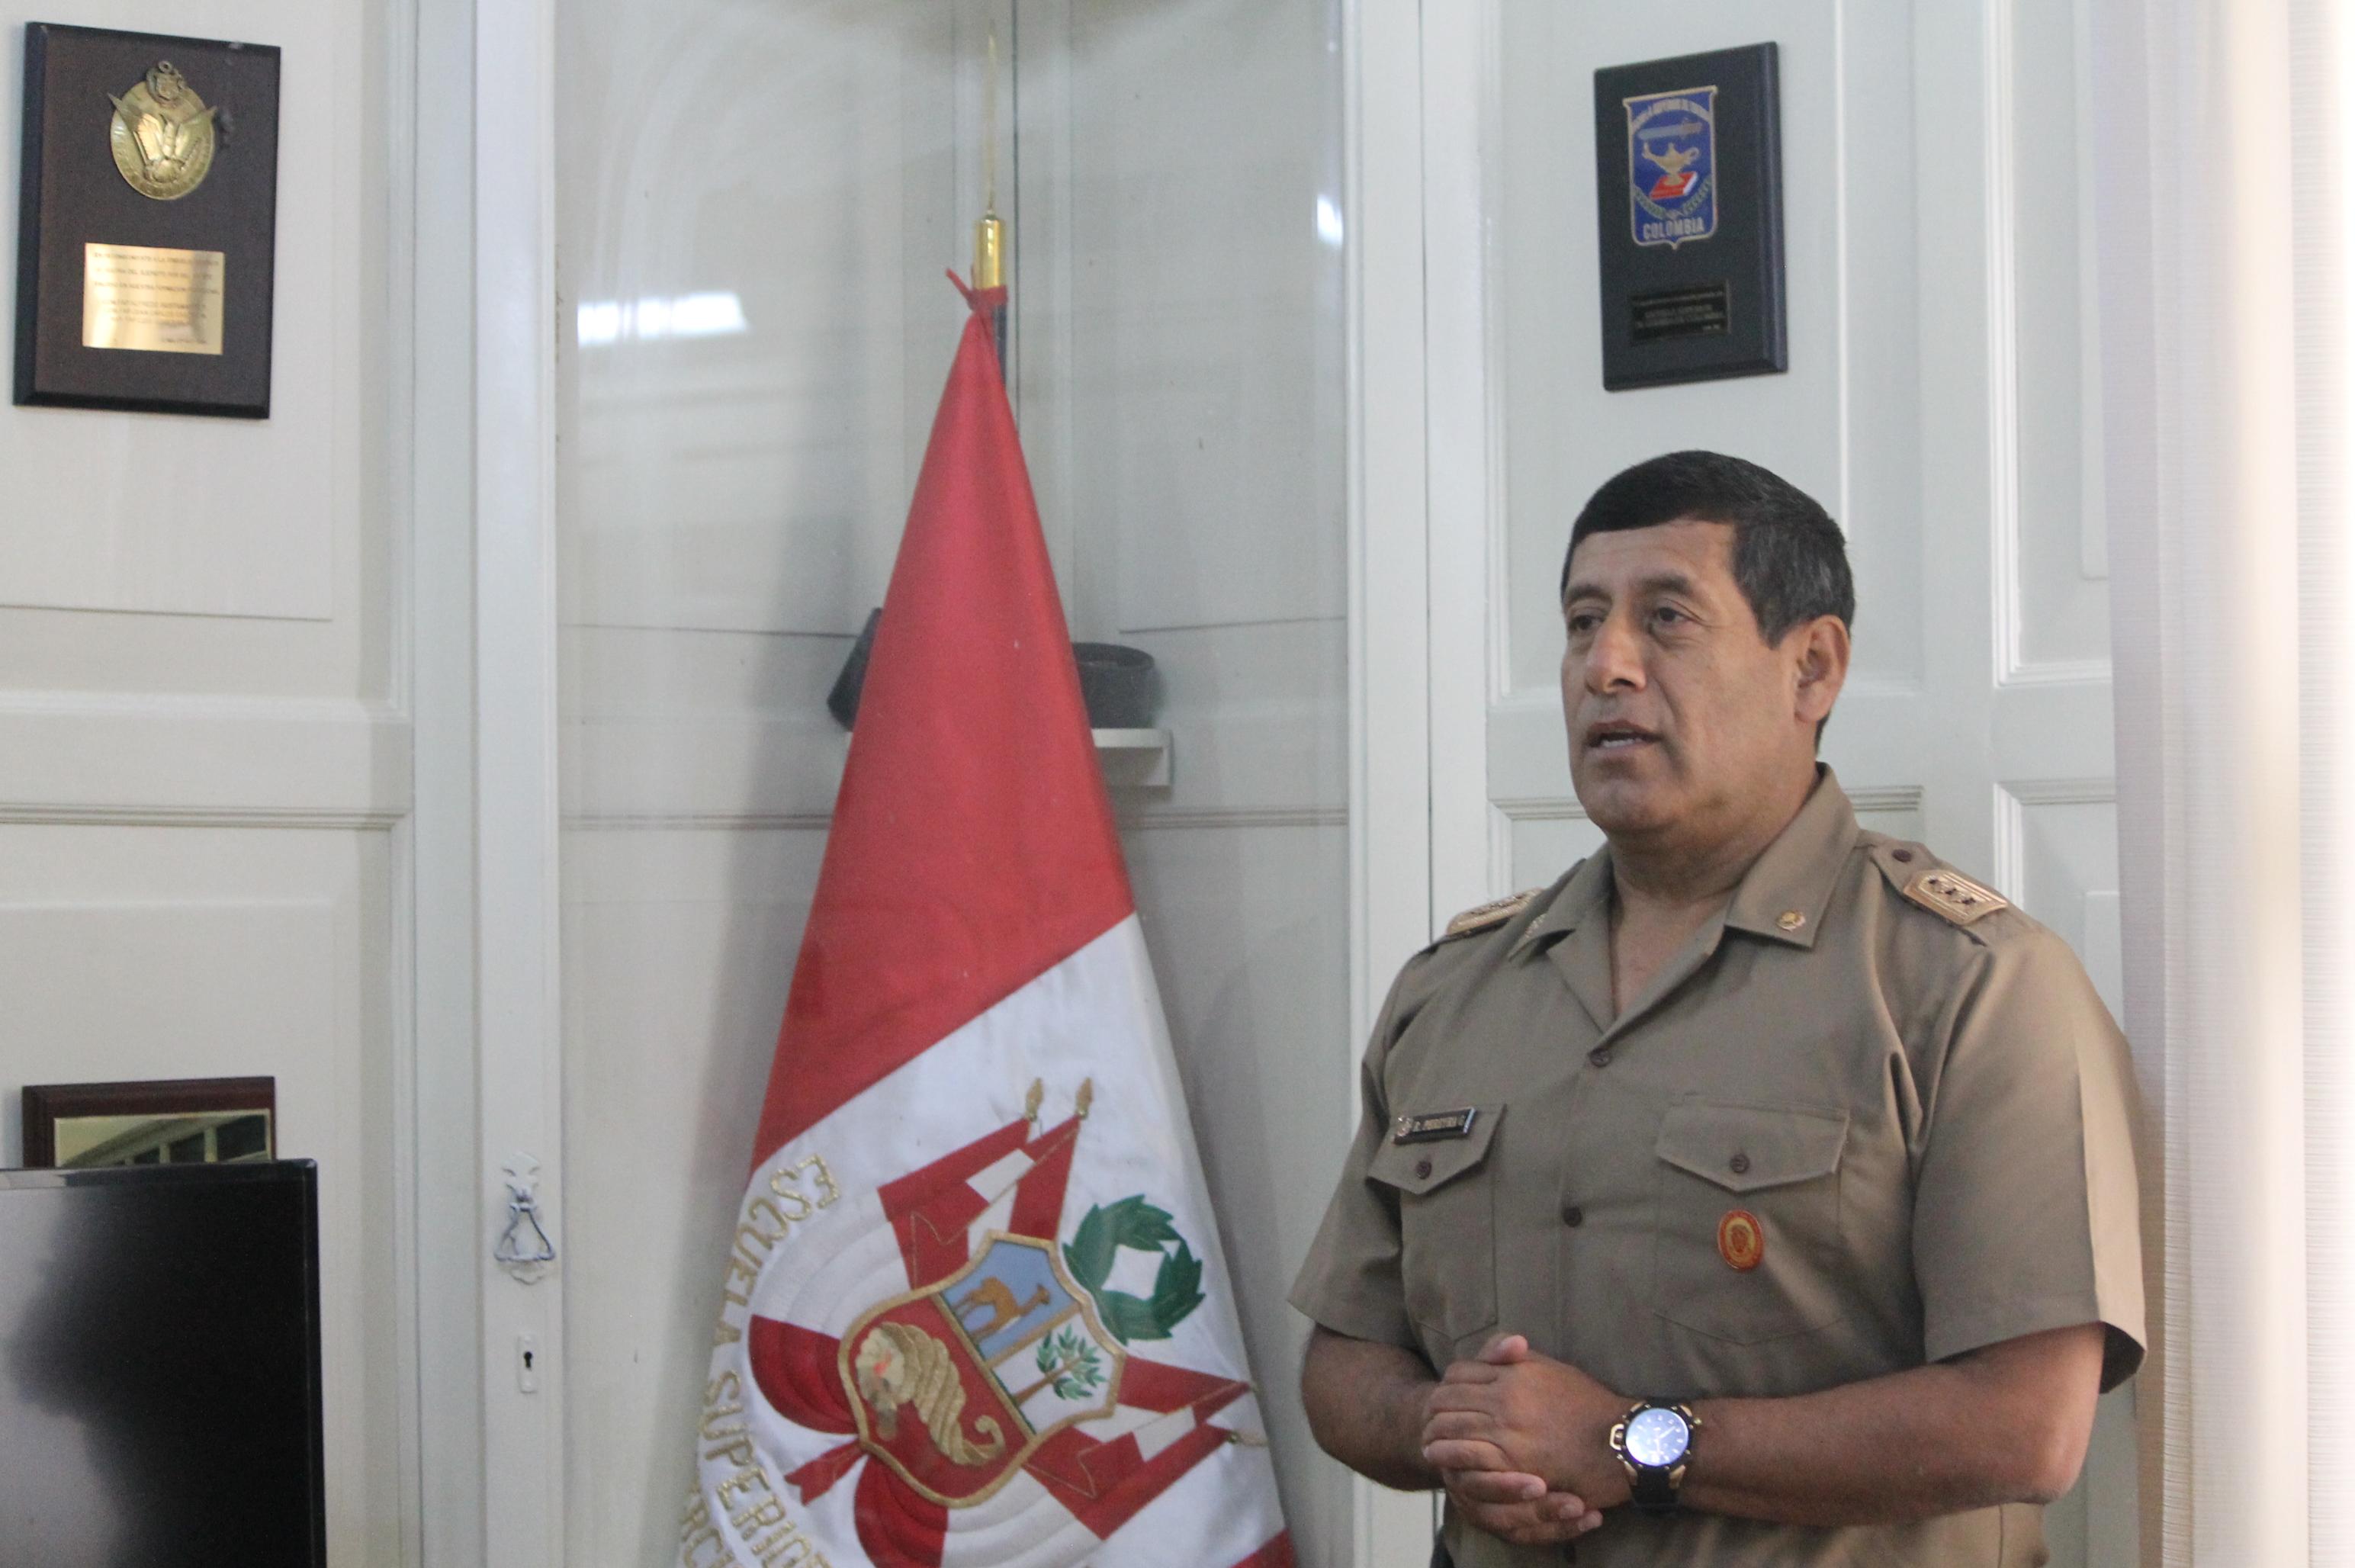 Peruvian War College Trains Future Military Leaders